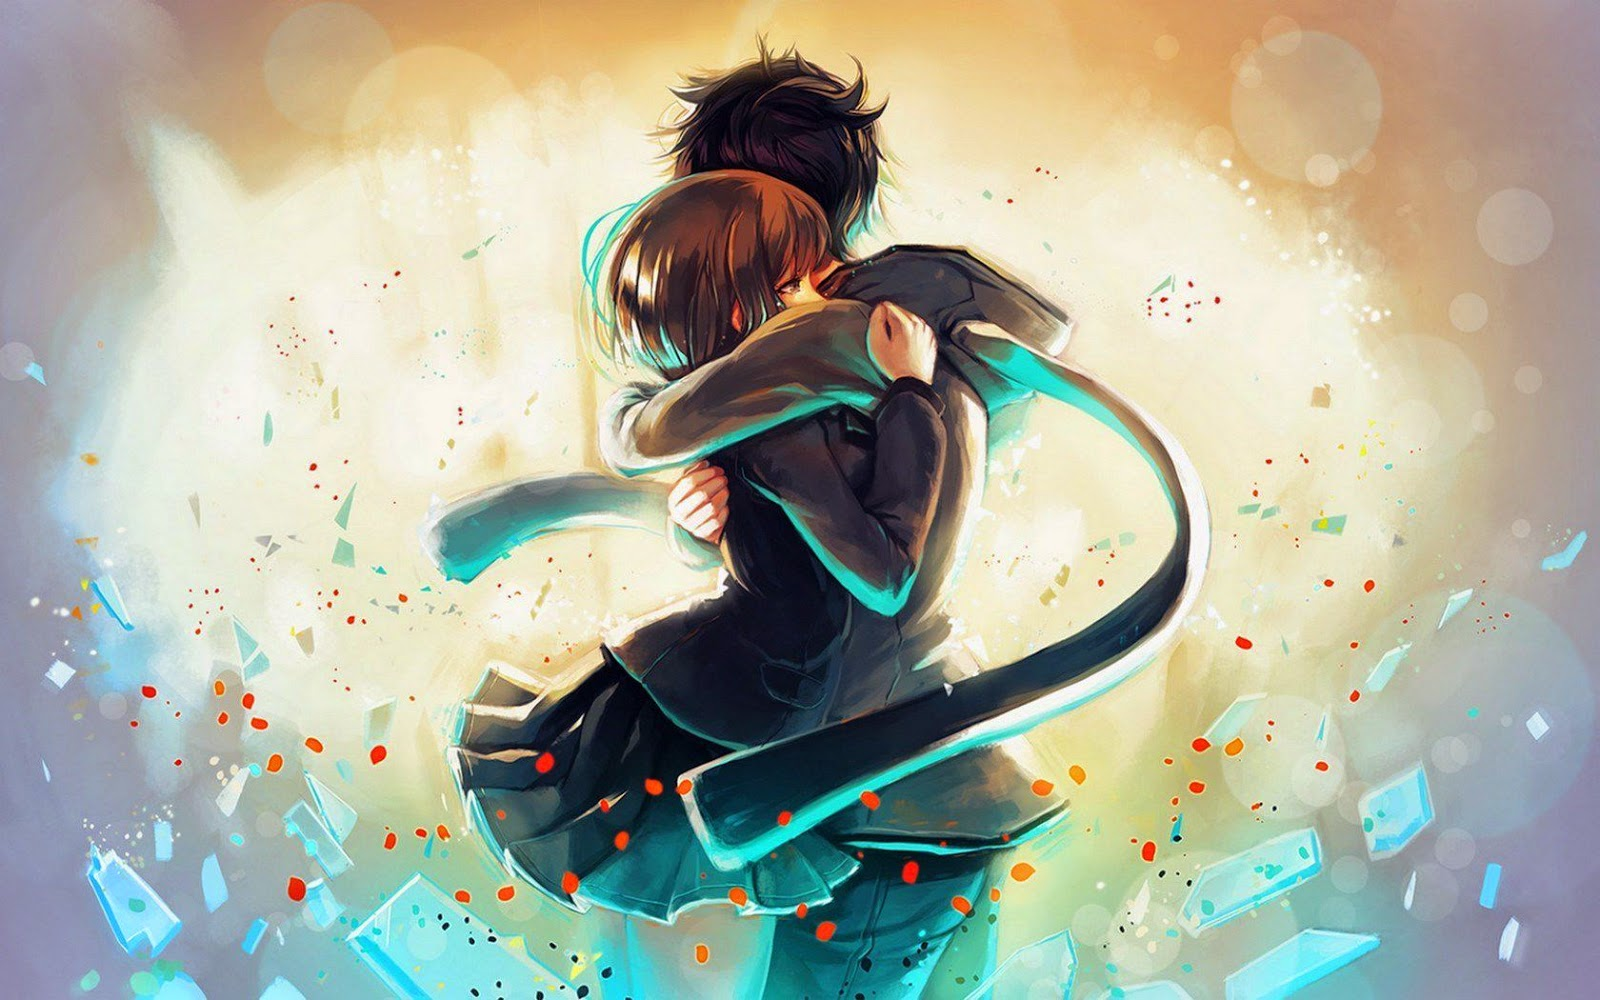 Anime Couple Lovely Hug Hd Wallper Best Love Hd Wallpapers